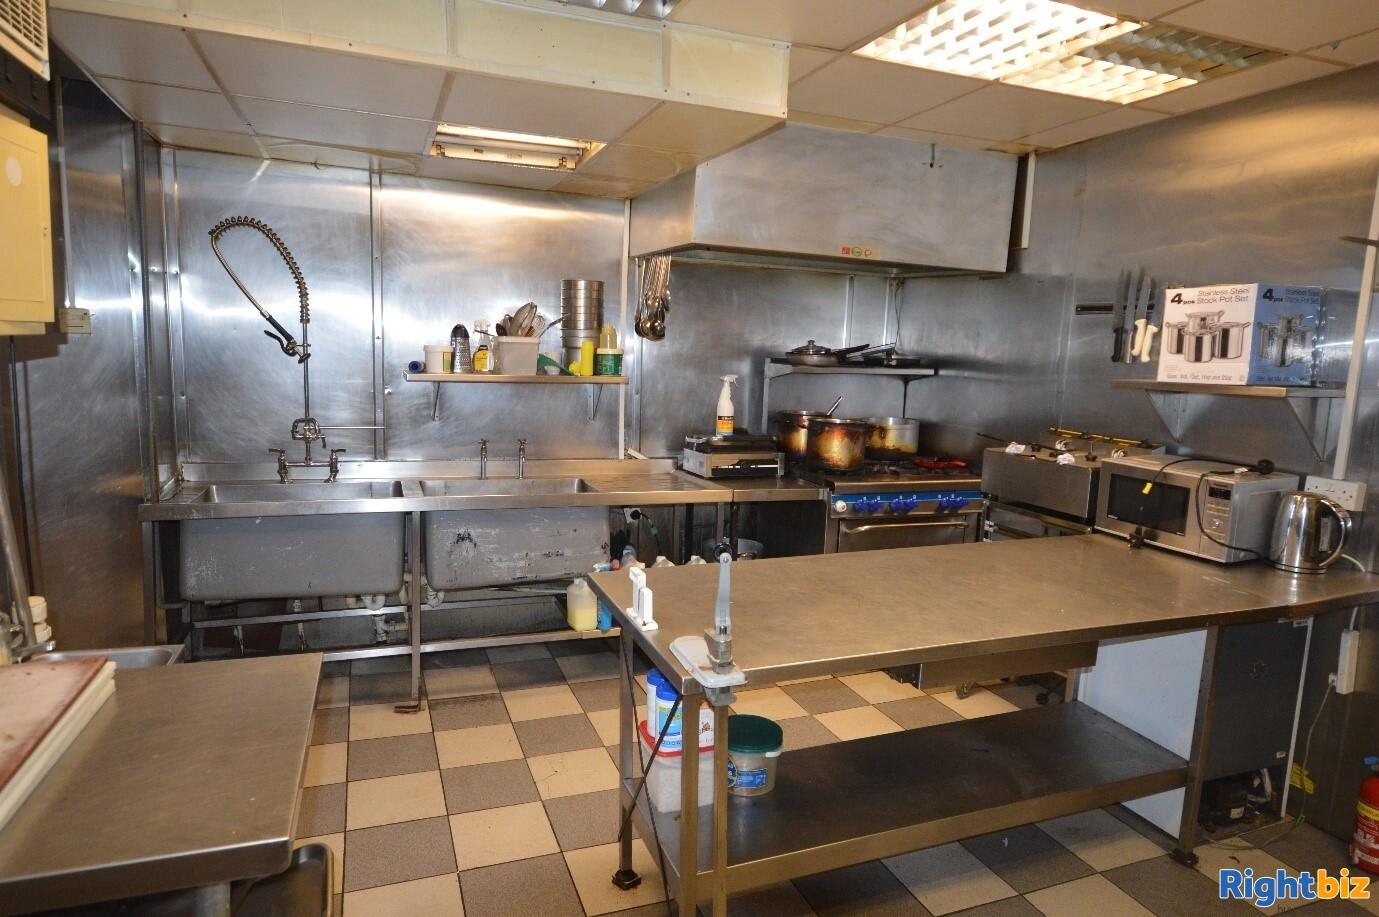 Full Class 3 hot food takeaway in Edinburgh city centre (ref 1396) - Image 9